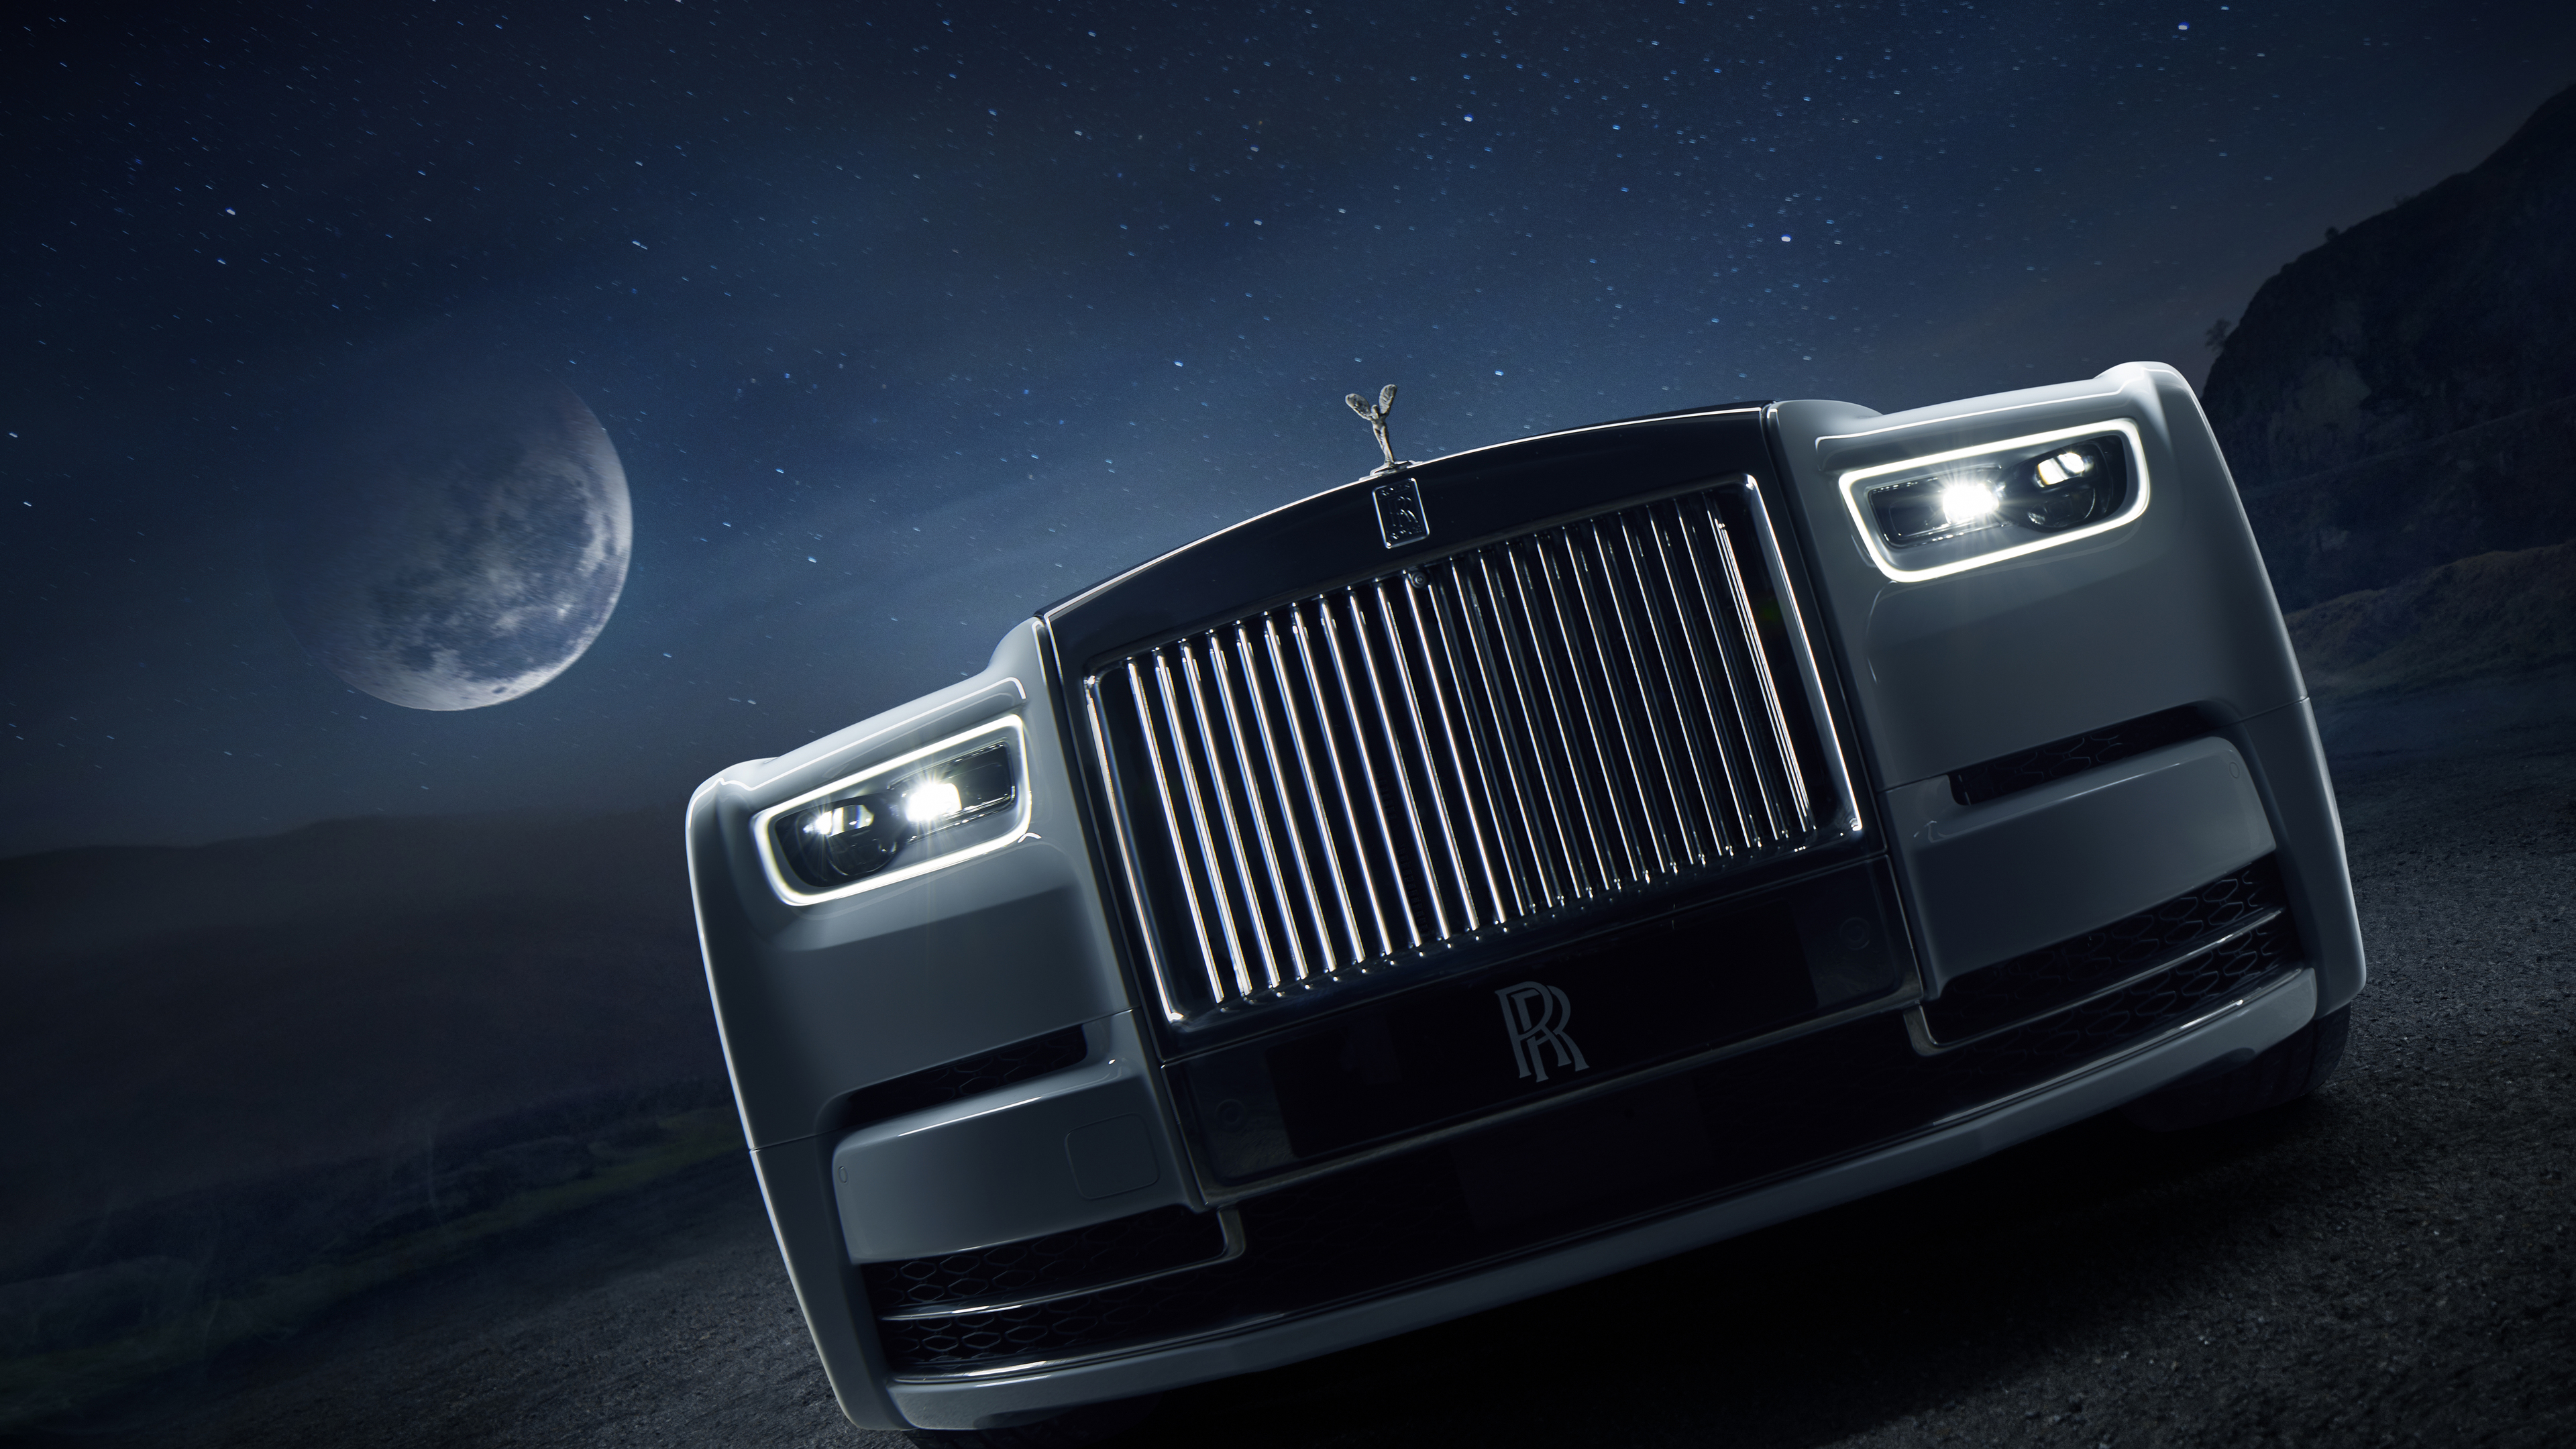 2019 rolls royce phantom tranquillity 4k 1554245352 - 2019 Rolls Royce Phantom Tranquillity 4k - rolls royce wallpapers, rolls royce phantom wallpapers, hd-wallpapers, cars wallpapers, 5k wallpapers, 4k-wallpapers, 2019 cars wallpapers